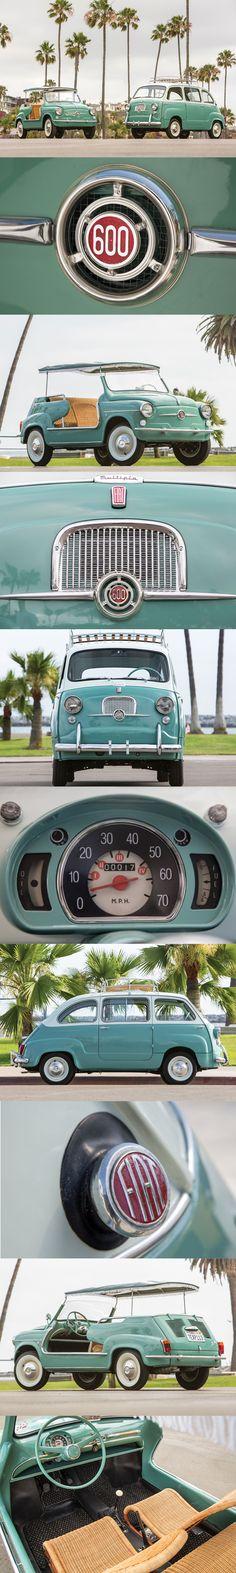 1957 Fiat 600 Multipla / 1961 Fiat 600 Jolly / mint green white / Italy / MPV / beach car